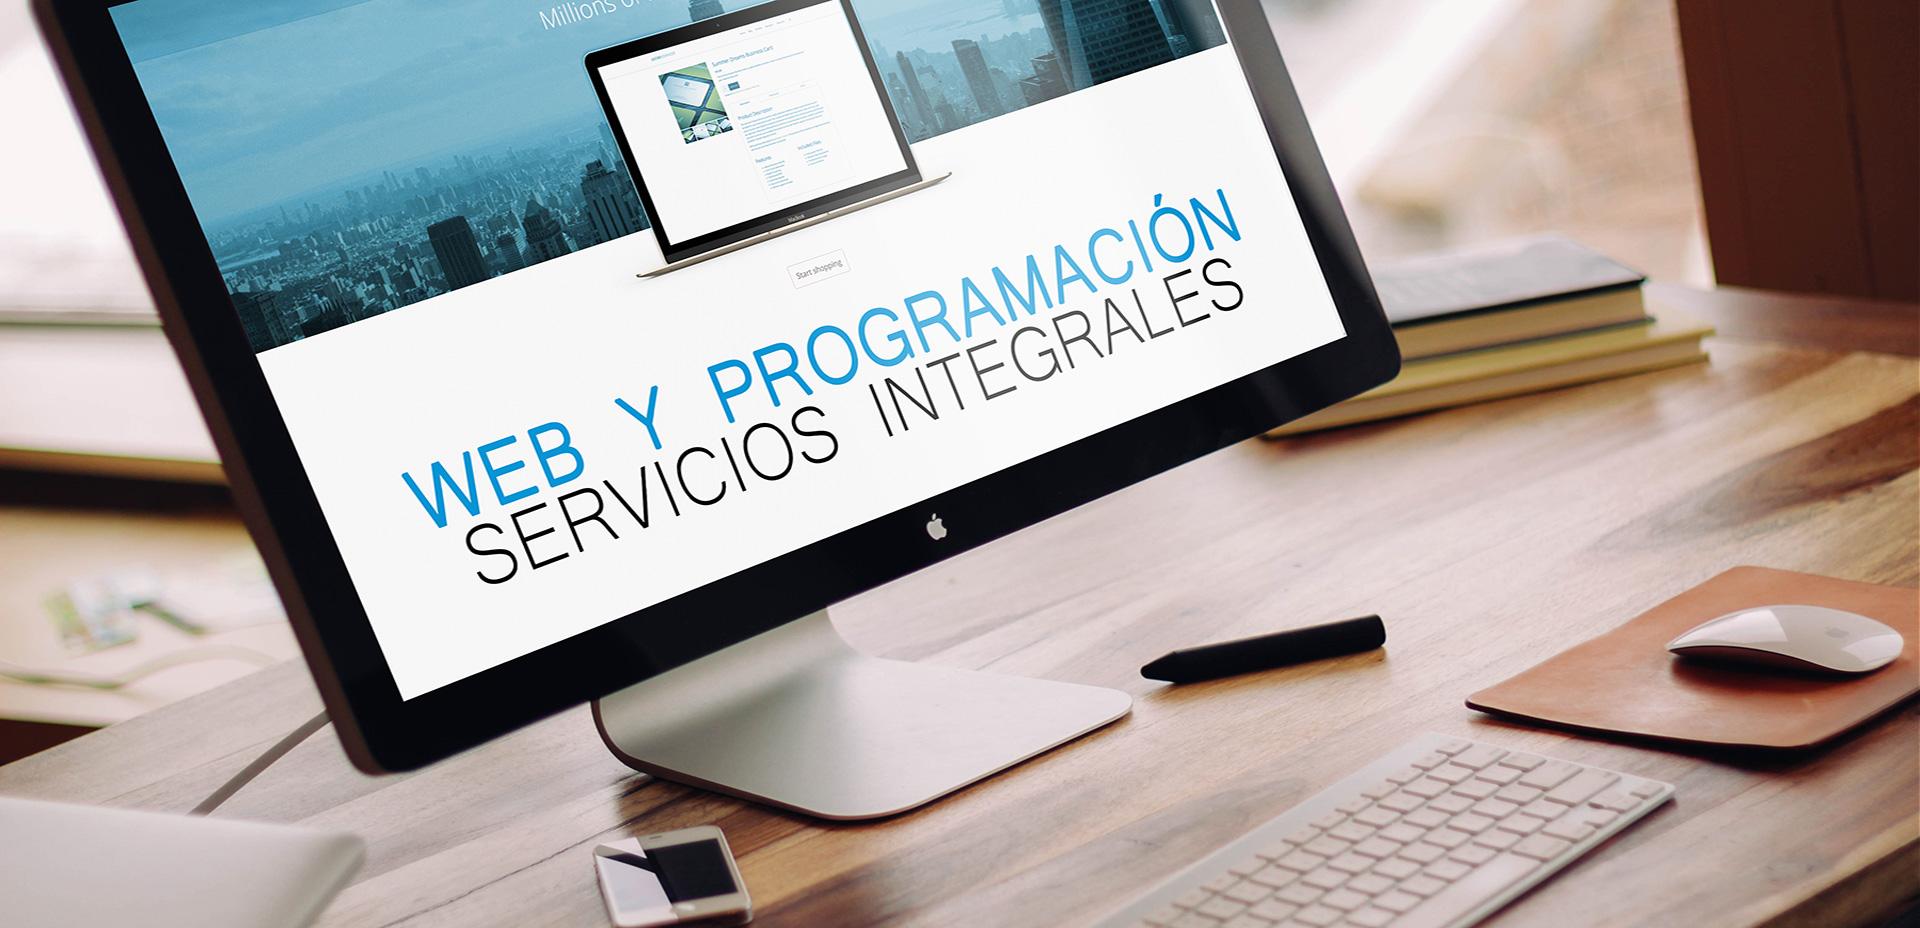 diseño web albacete, diseño web, estudio de diseño web, web albacete, programación web, programación web albacete, krema